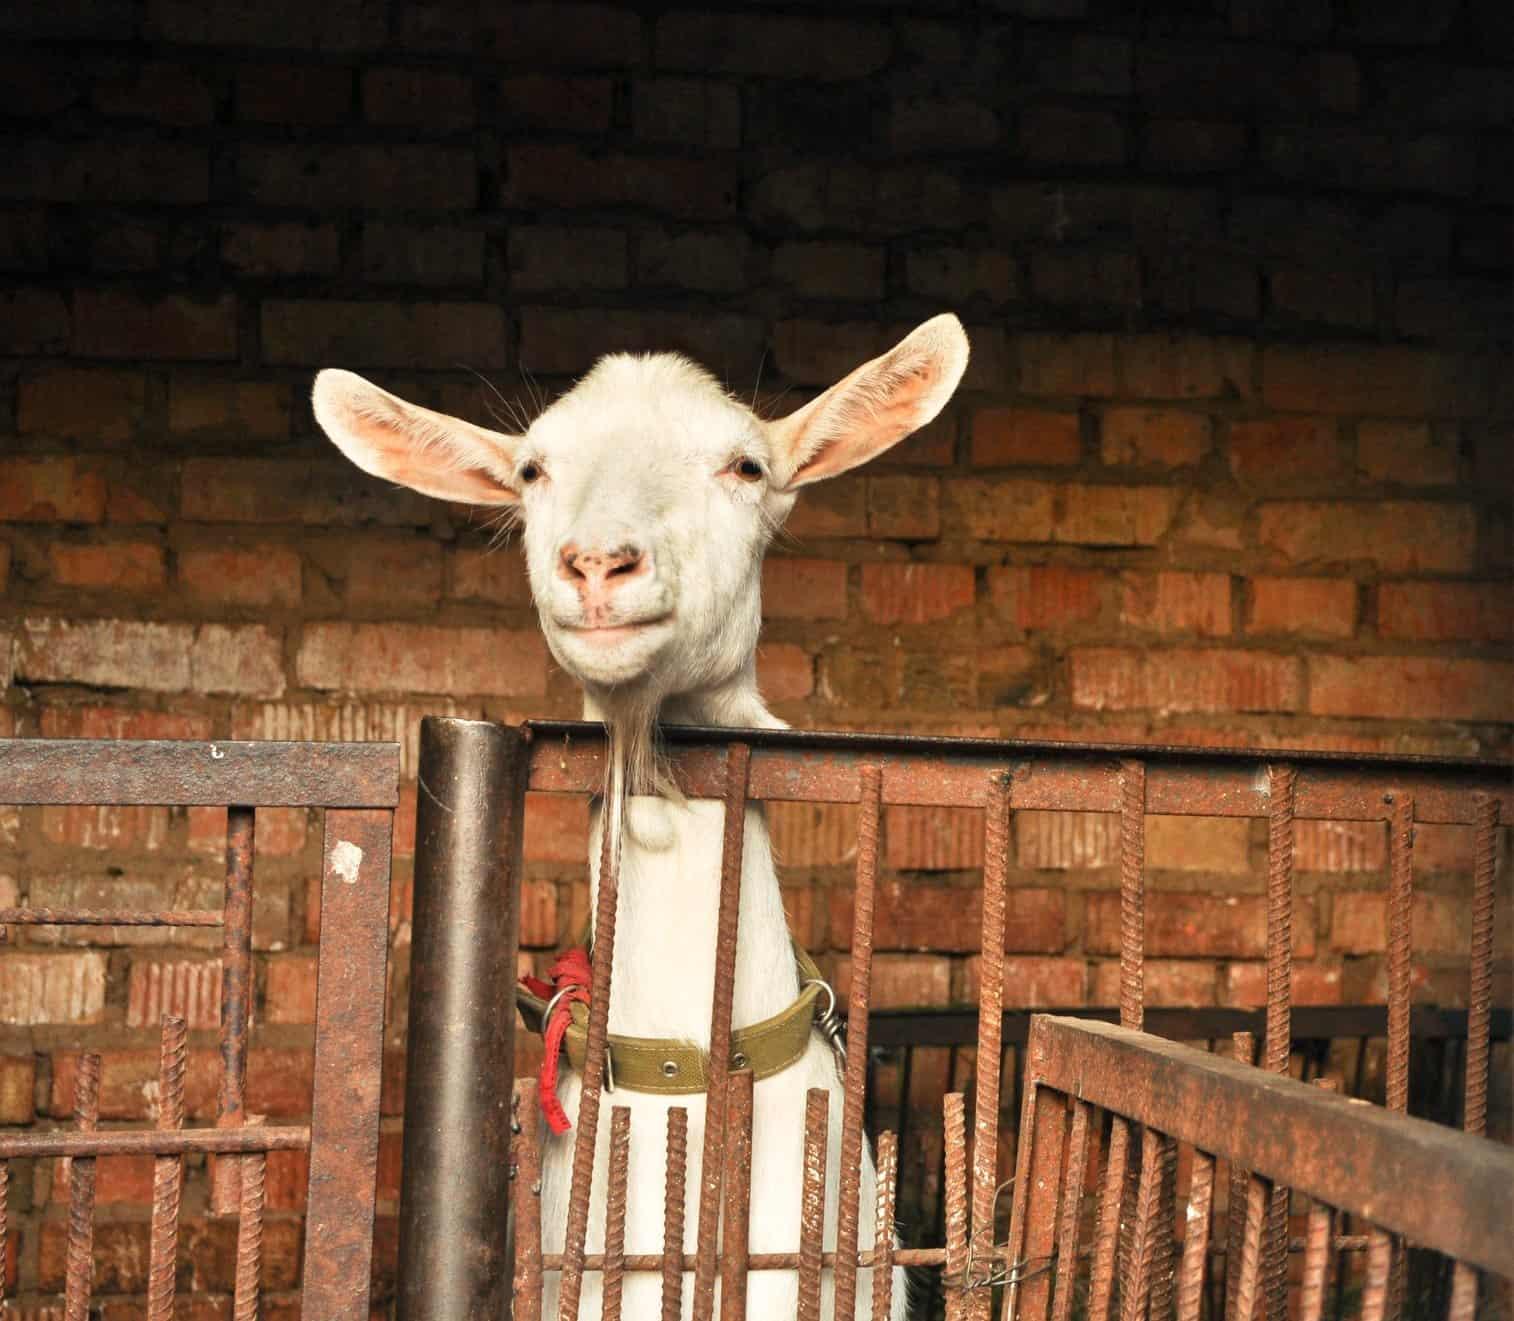 goat_barrier_global-skills_barrier_too?